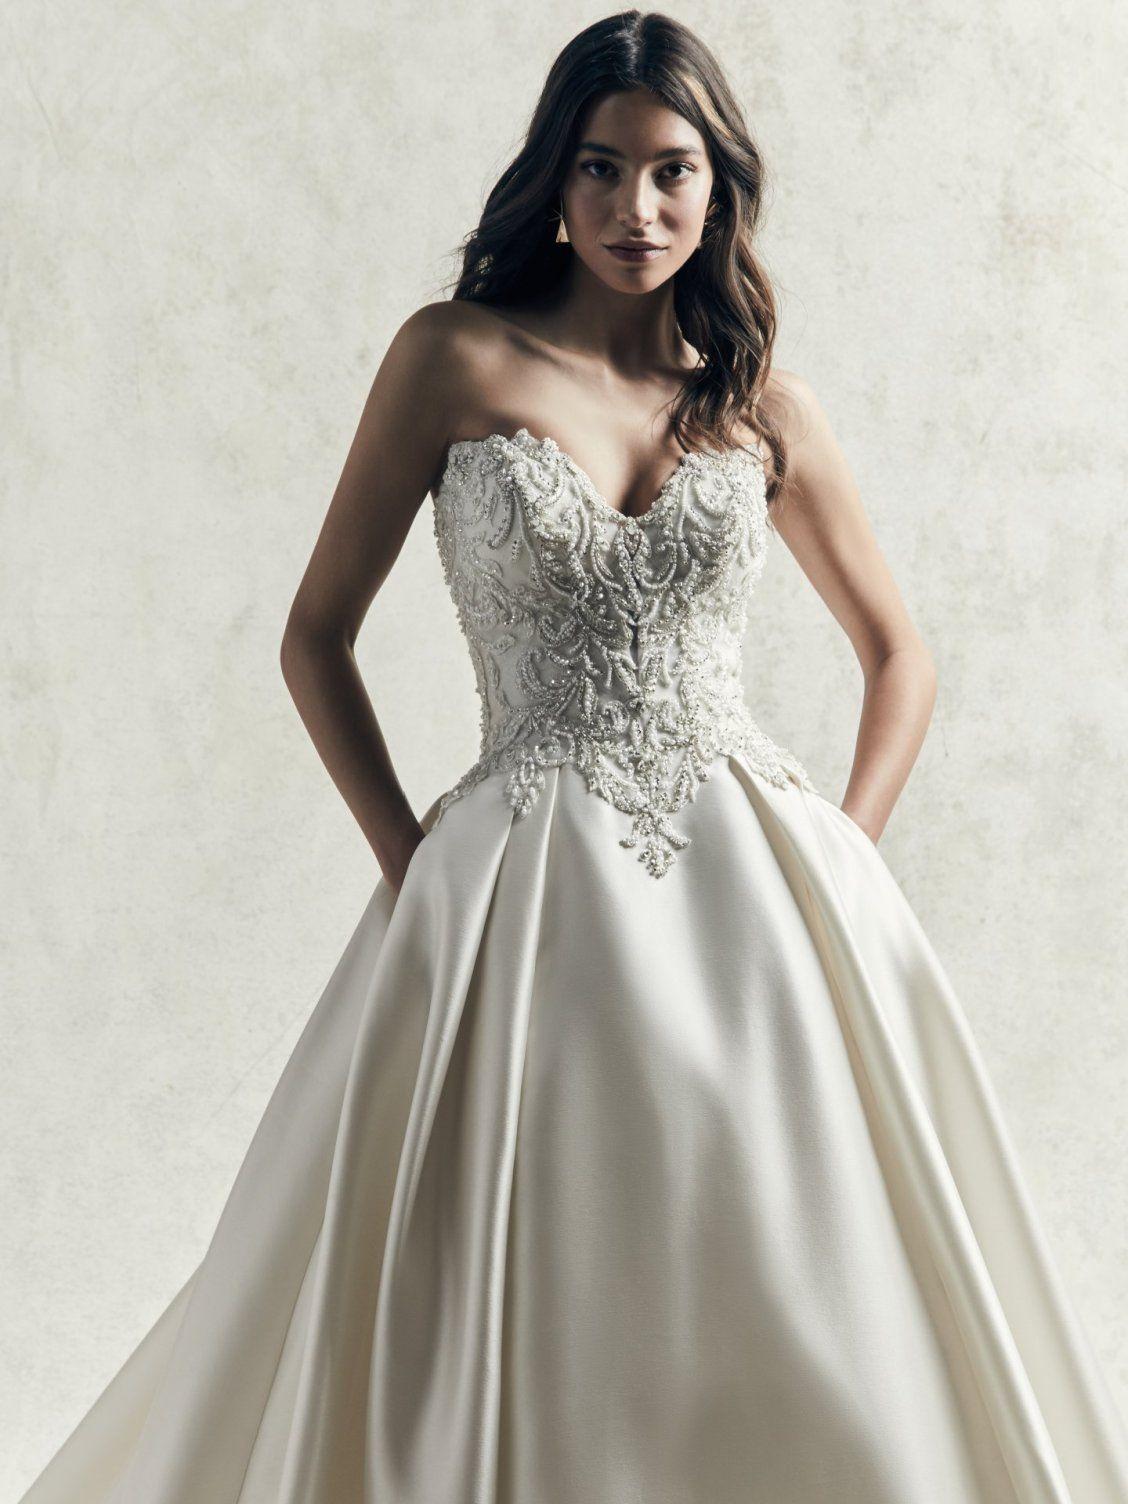 Kimora By Sottero And Midgley Wedding Dresses And Accessories Ball Gowns Wedding Sottero And Midgley Wedding Dresses Designer Wedding Dresses [ 1504 x 1128 Pixel ]